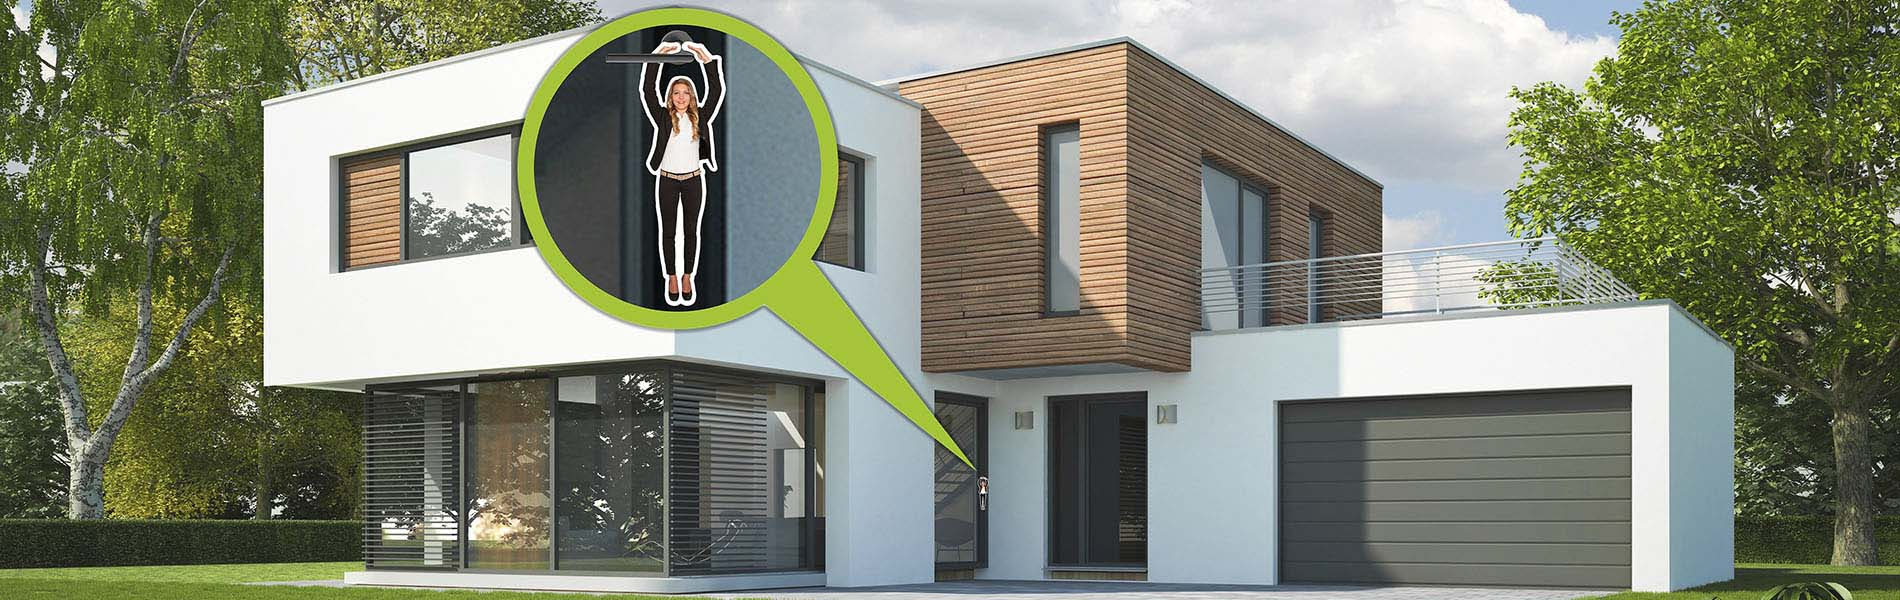 immobilienmakler miriam t rh nger an immobilie in. Black Bedroom Furniture Sets. Home Design Ideas